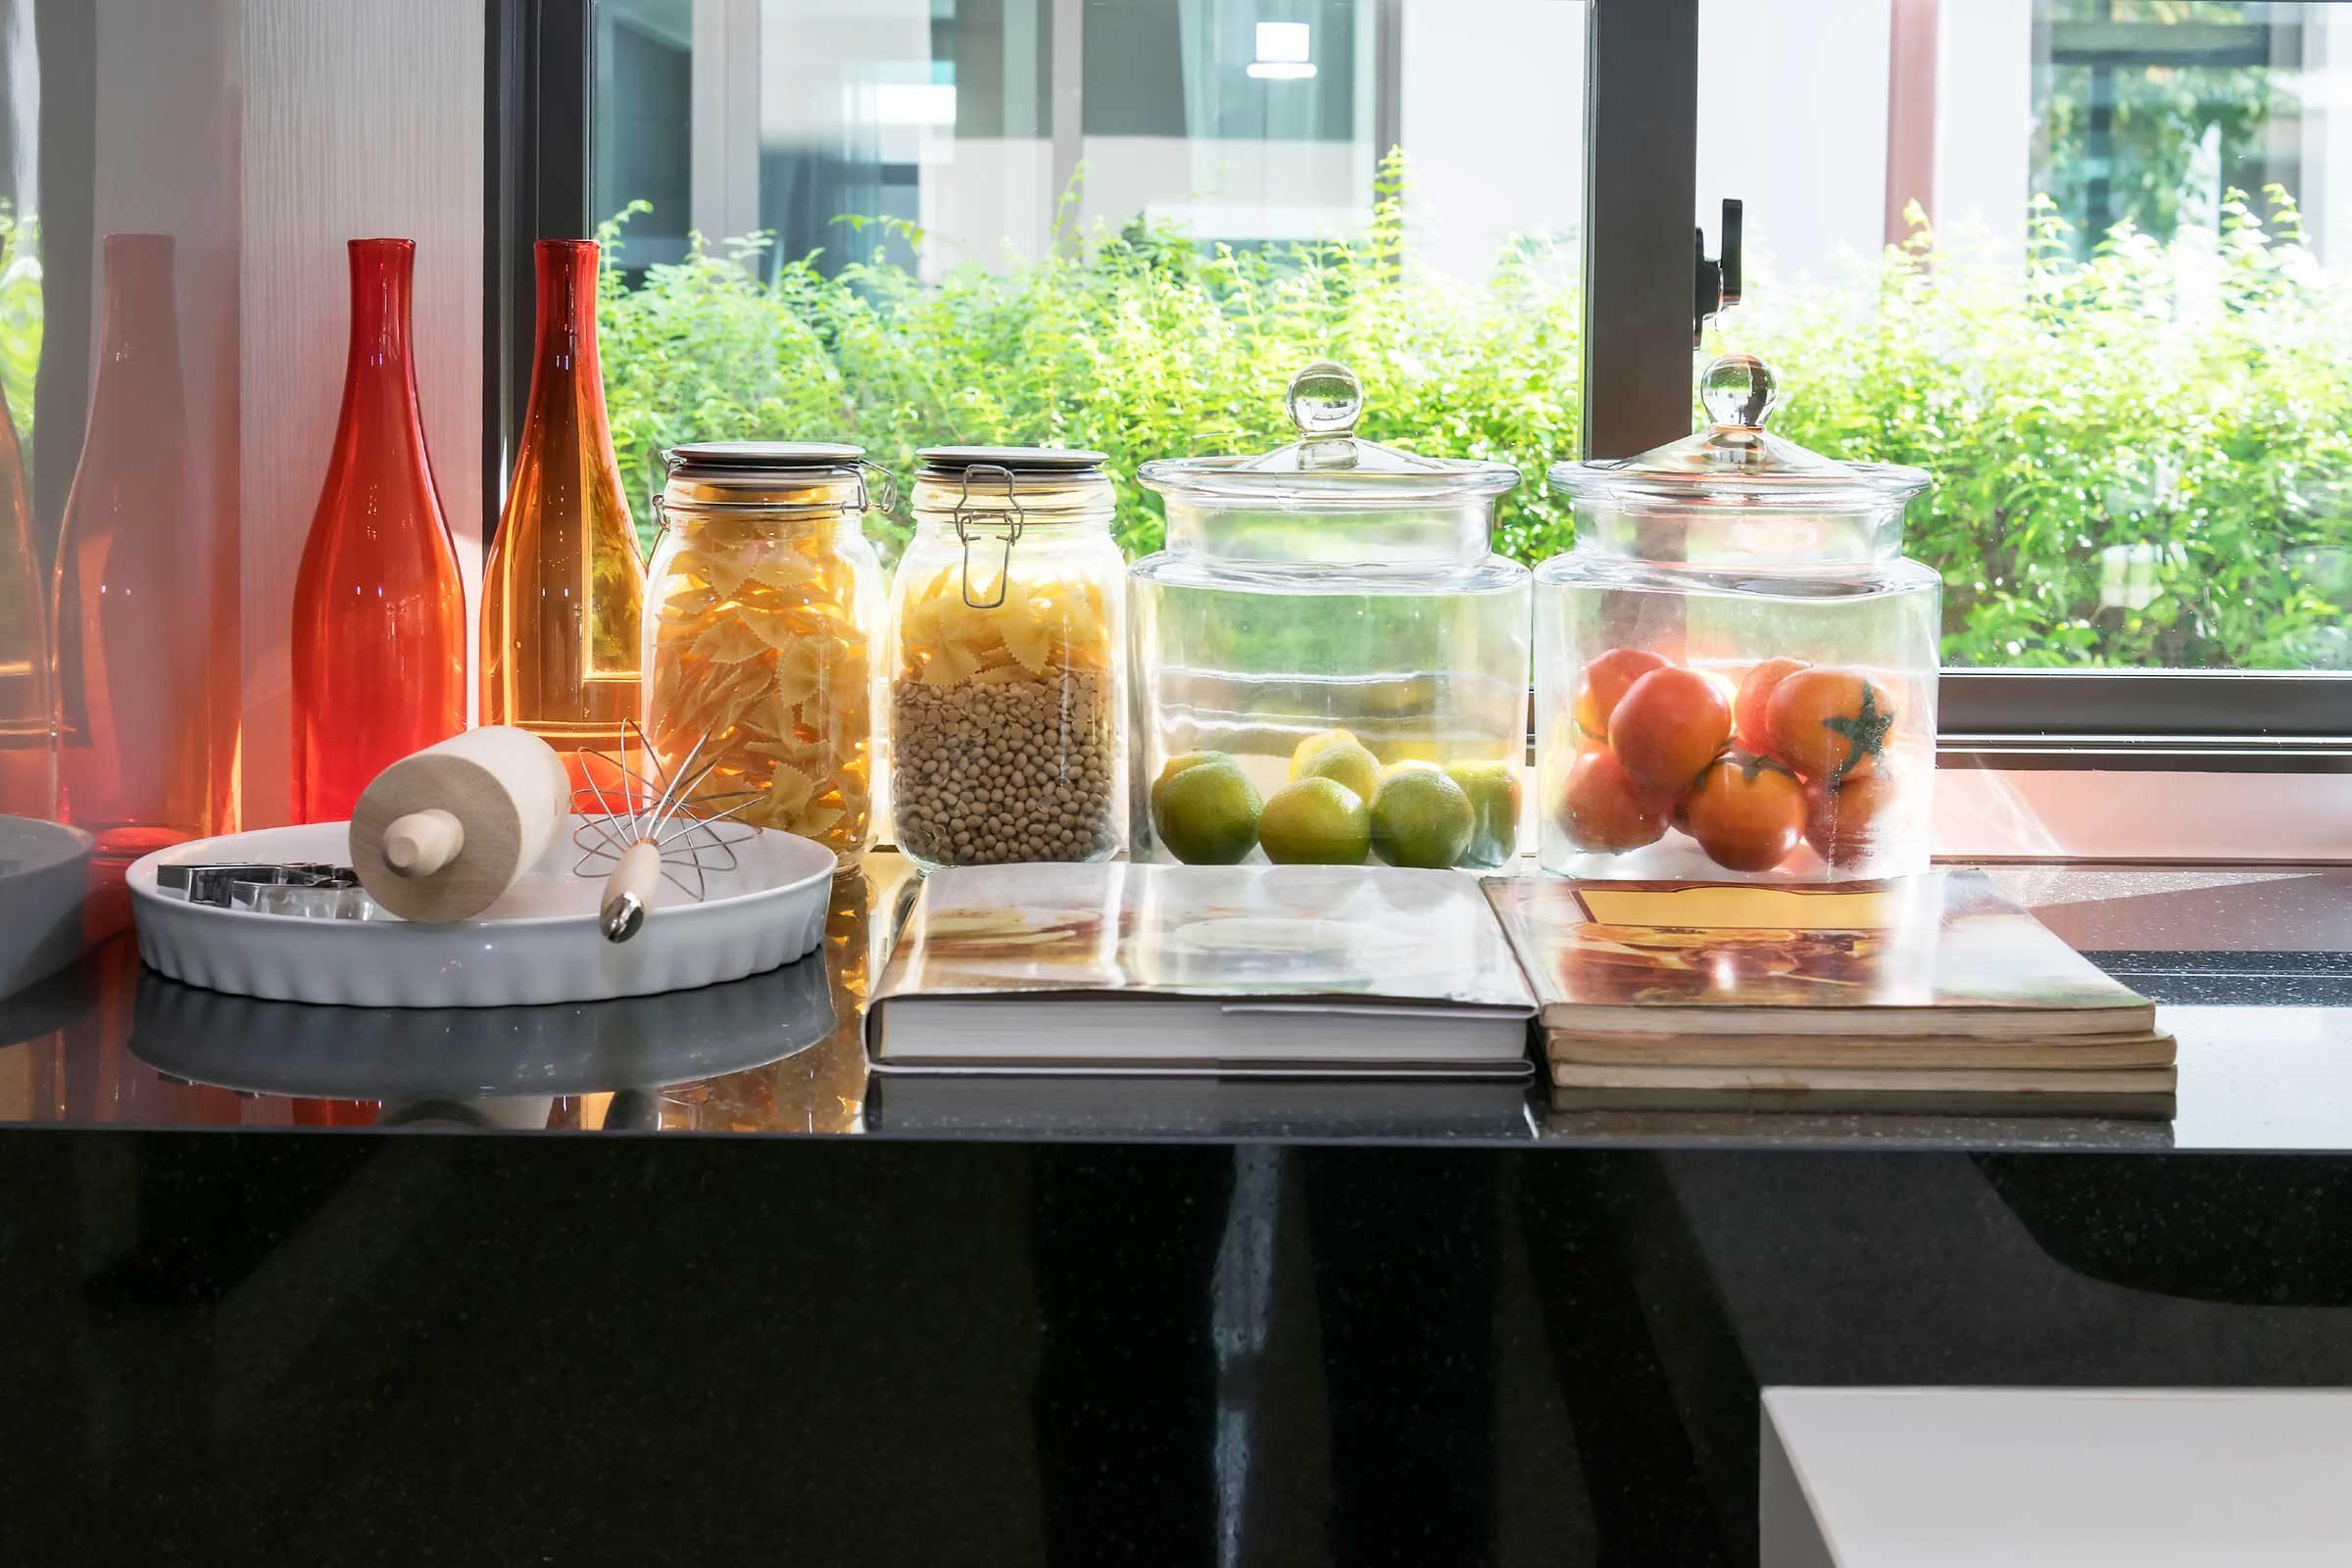 Kitchen Organization Tips For Healthier Eating Reader S Digest